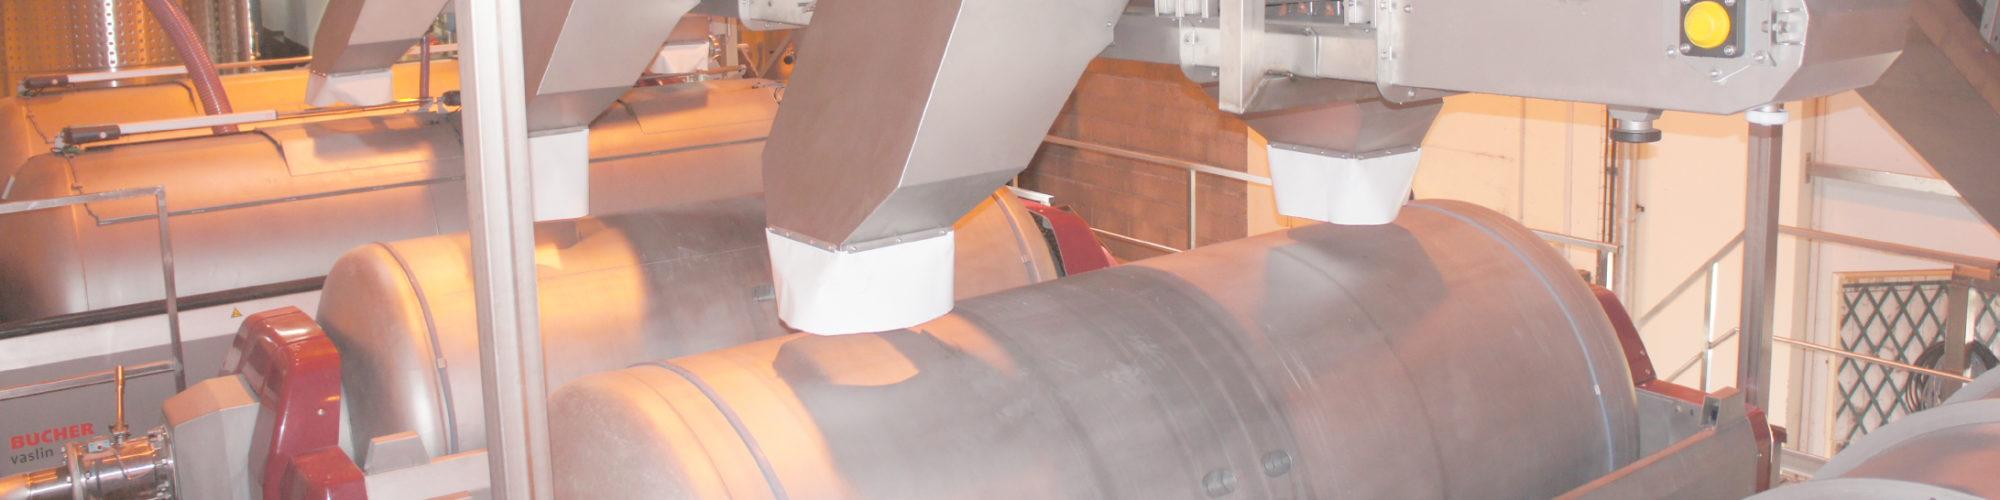 Ingeco - Ingénierie vinicole : Depaquit